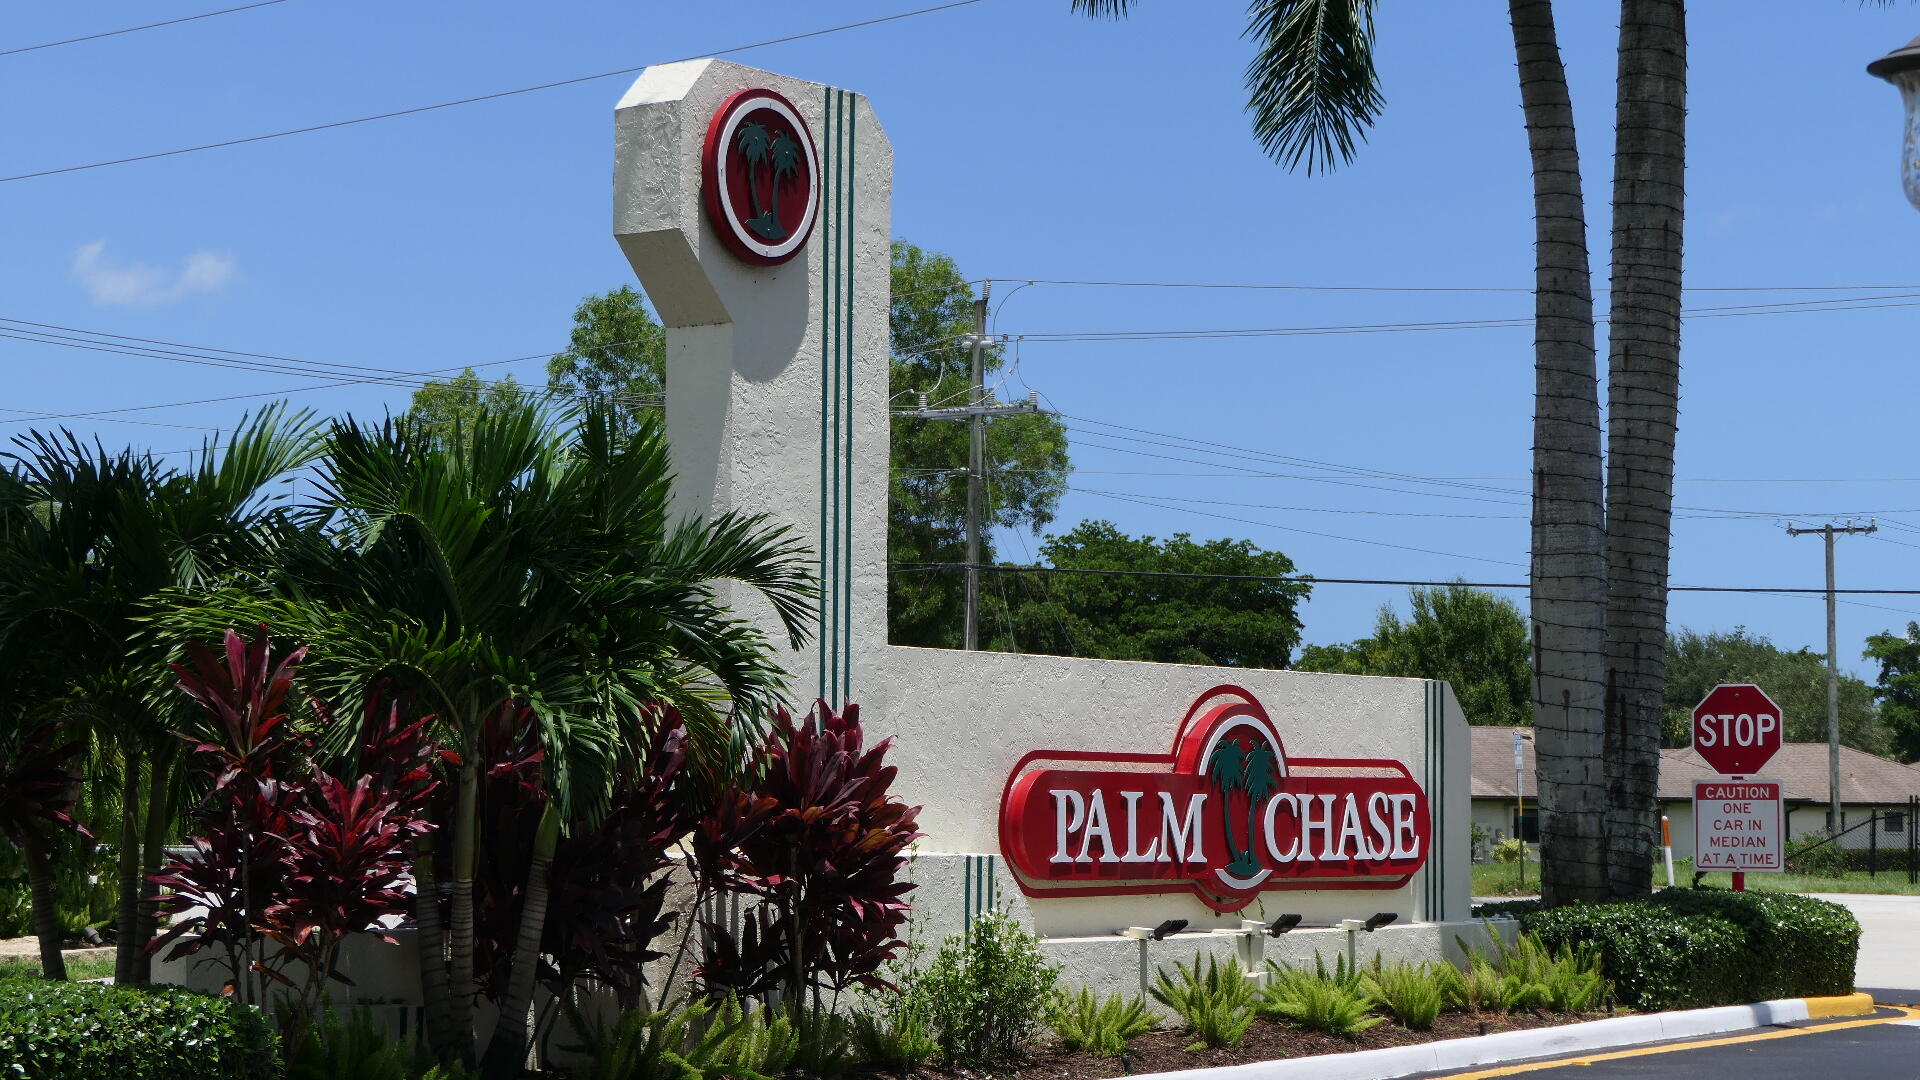 10804 Bahama Palm Way 101 Boynton Beach, FL 33437 photo 50